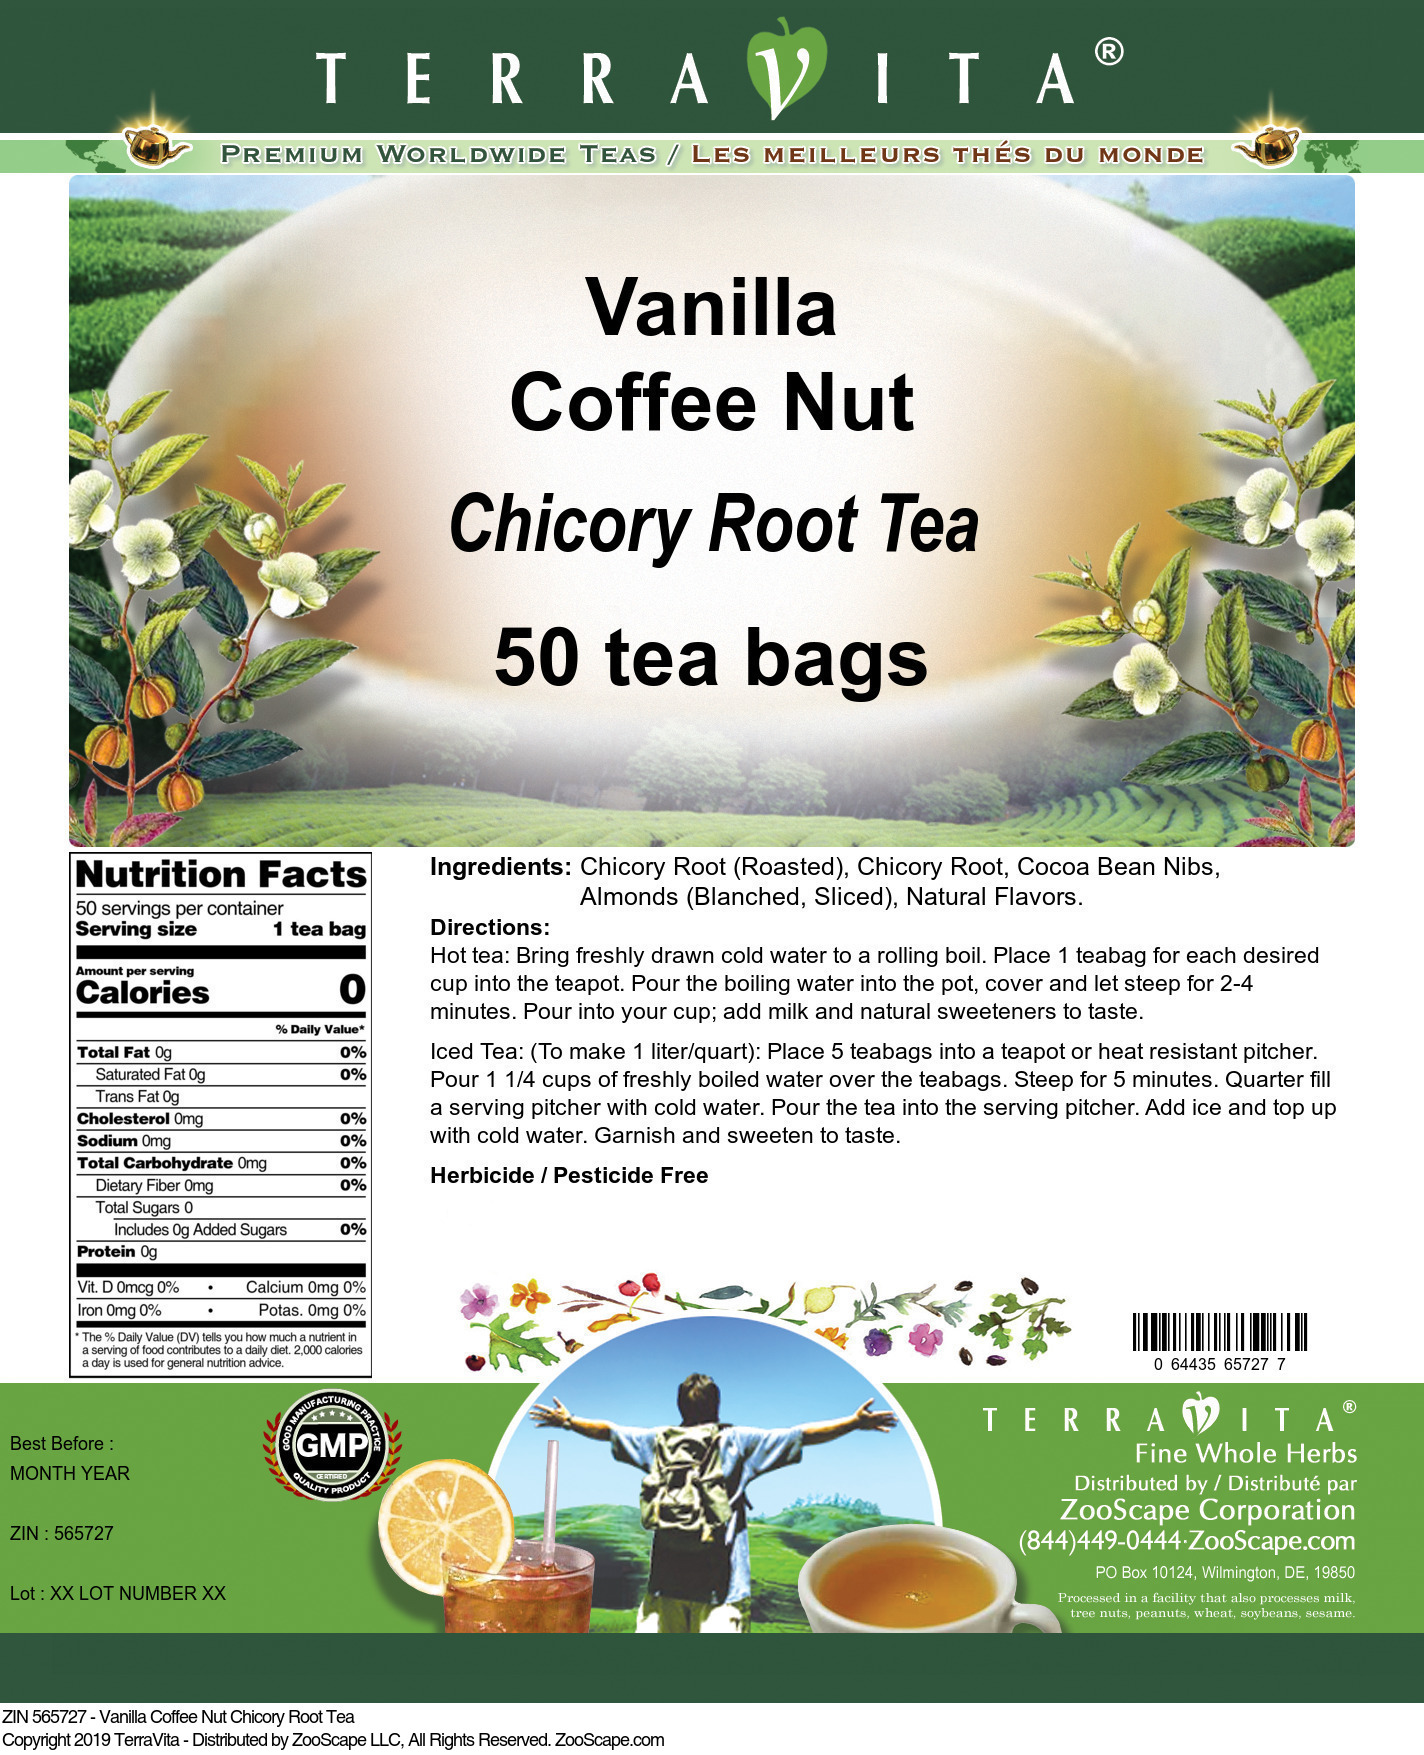 Vanilla Coffee Nut Chicory Root